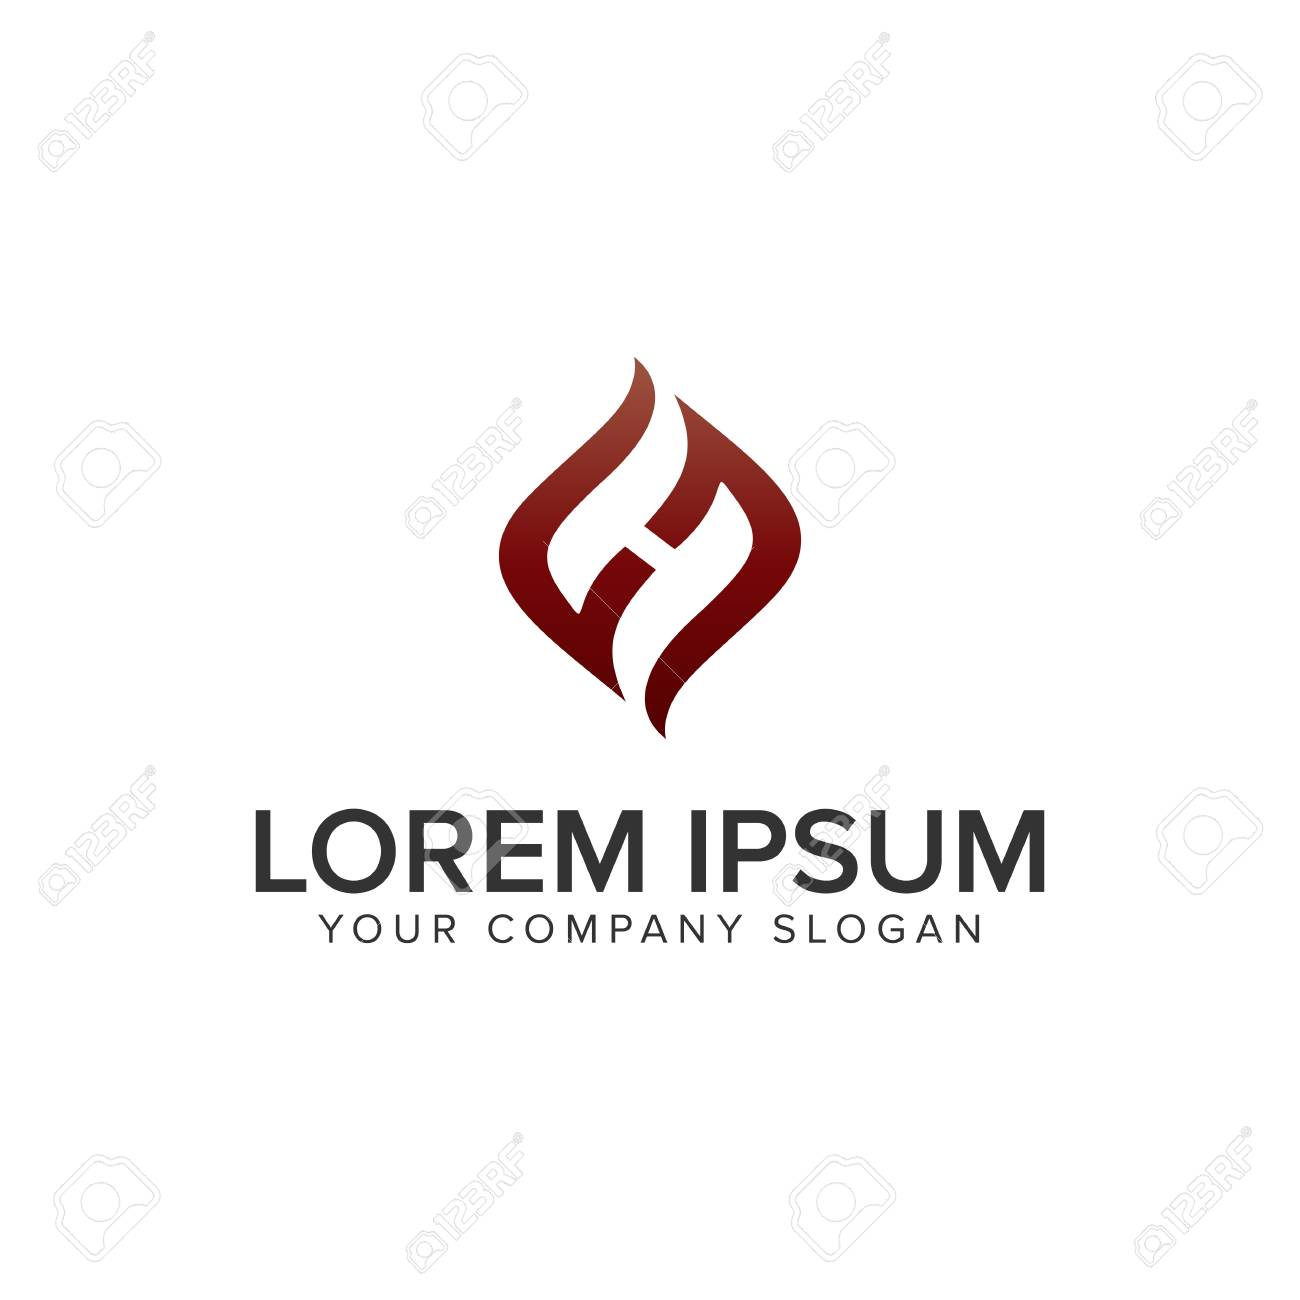 letter h creative unique logo design concept template fully